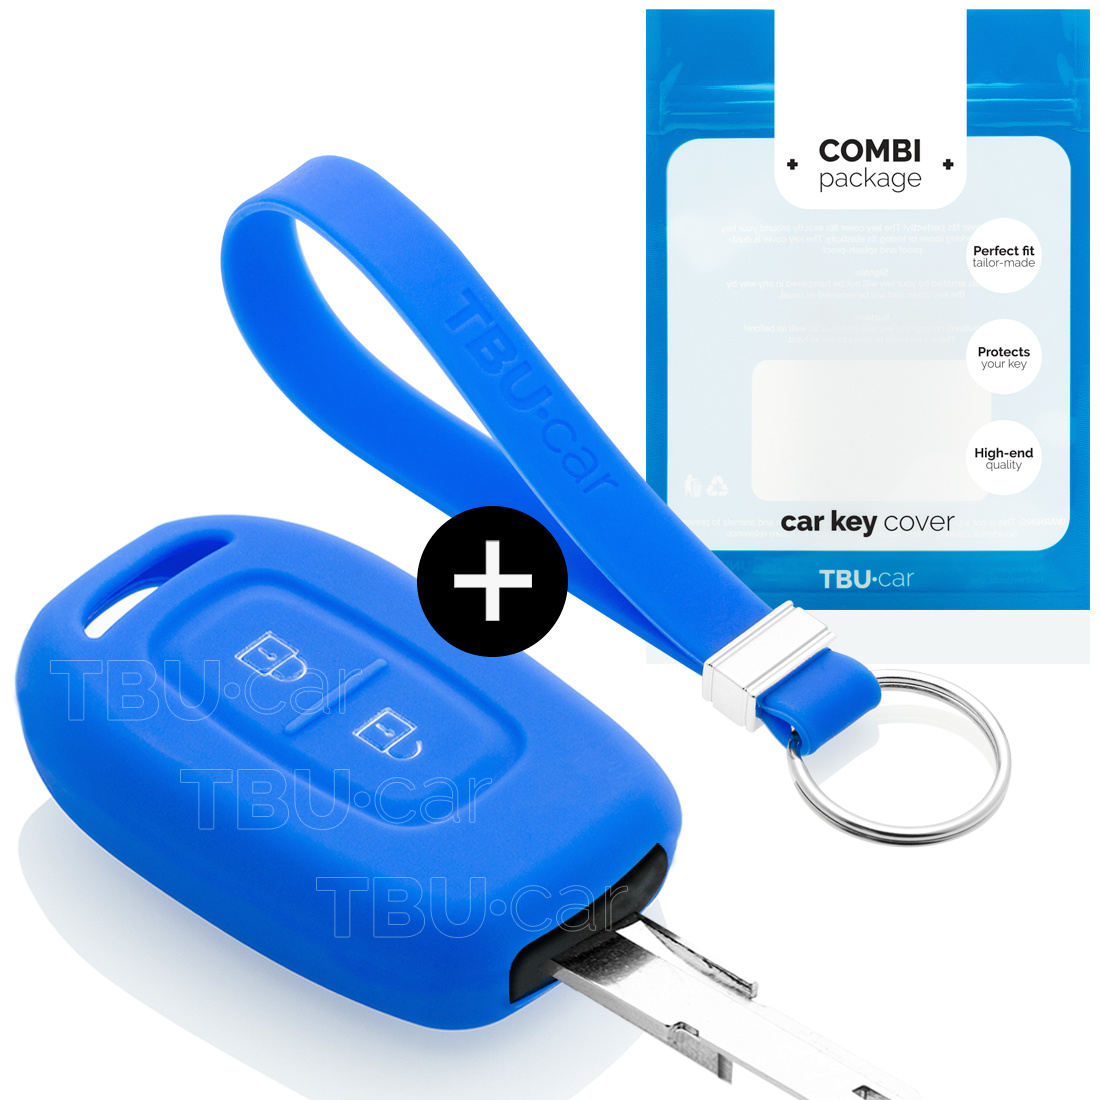 Dacia Car key cover - Silicone Protective Remote Key Shell - FOB Case Cover - Blue